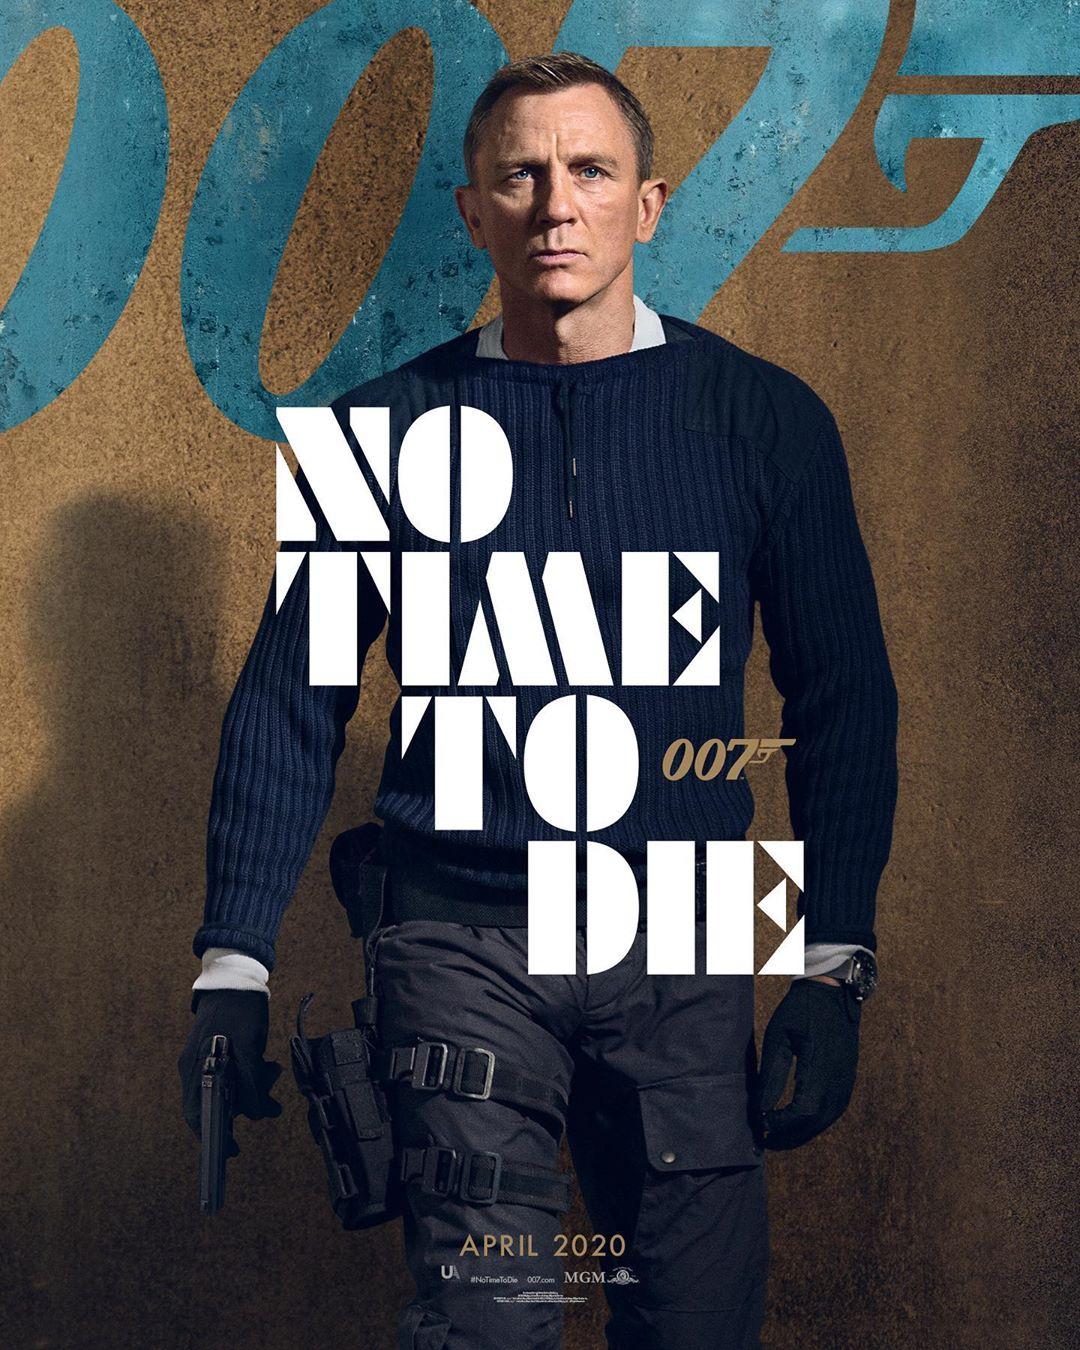 Bond25 is dead. Long live ...